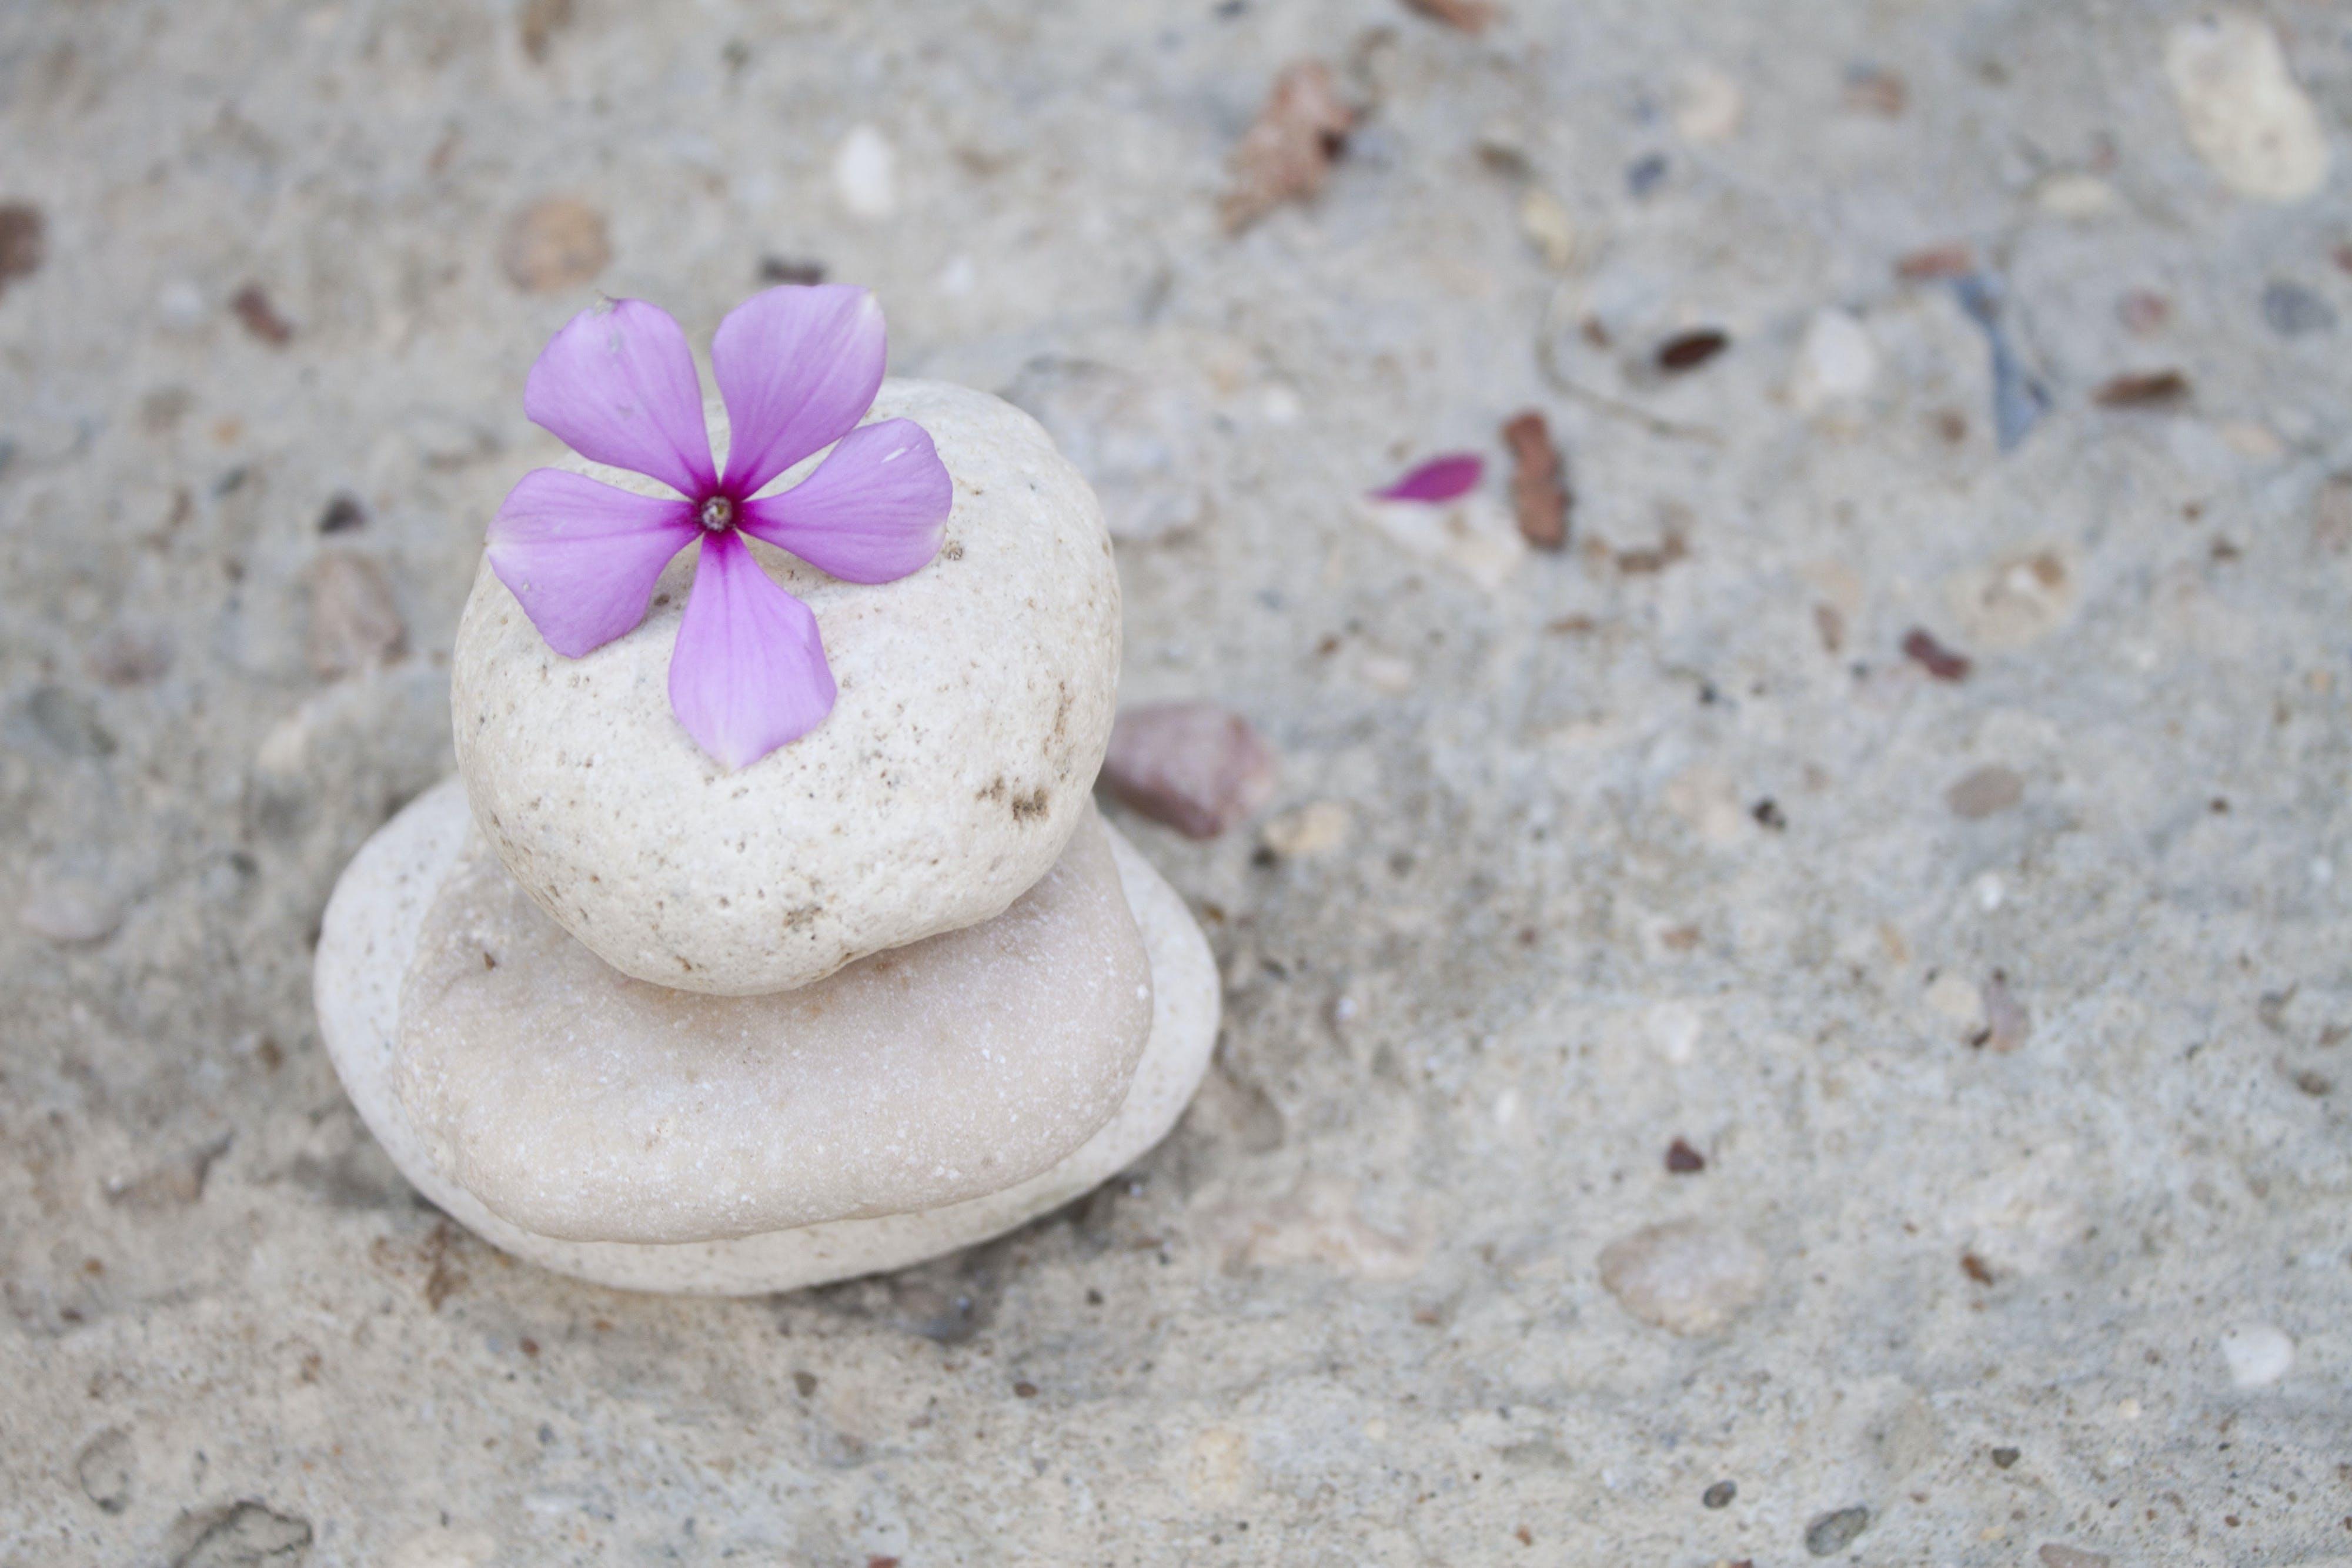 Free stock photo of flowers, photos, pink, rocks